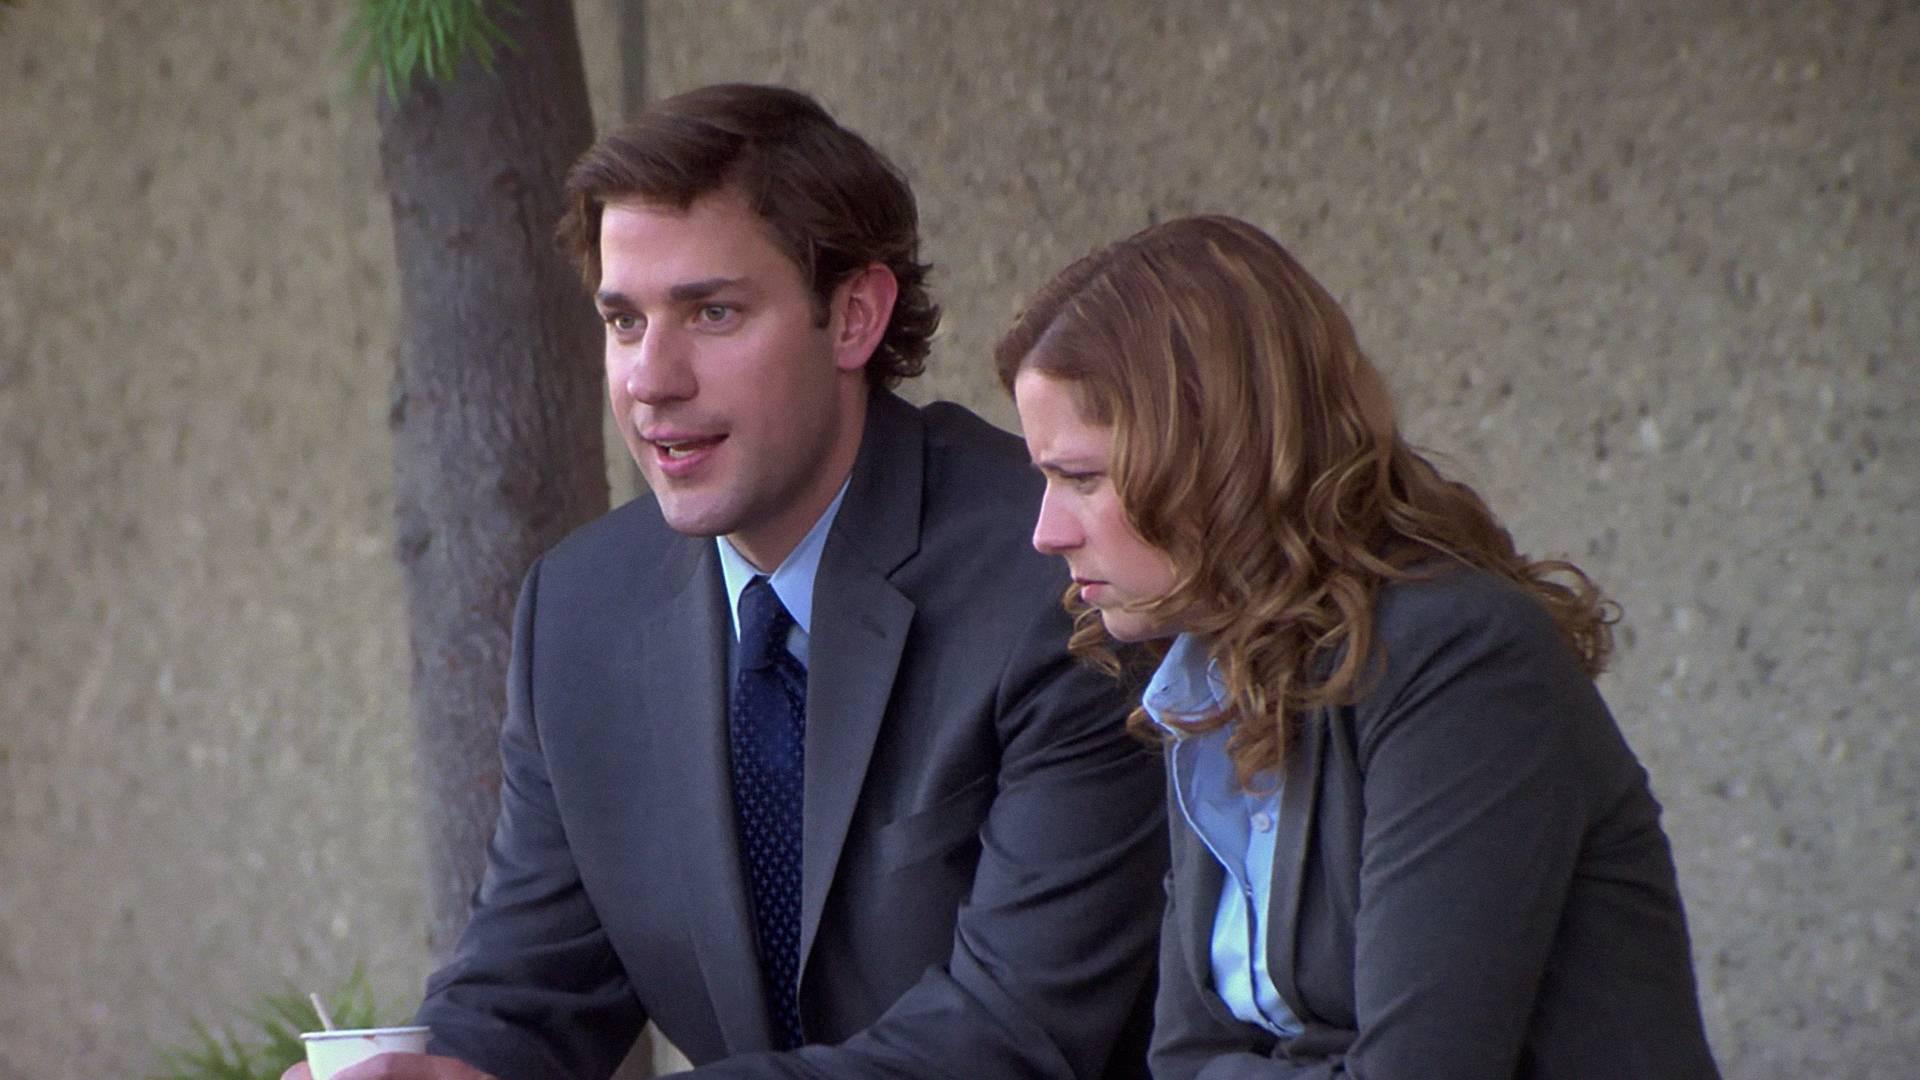 The Office Season 6 Episode 7